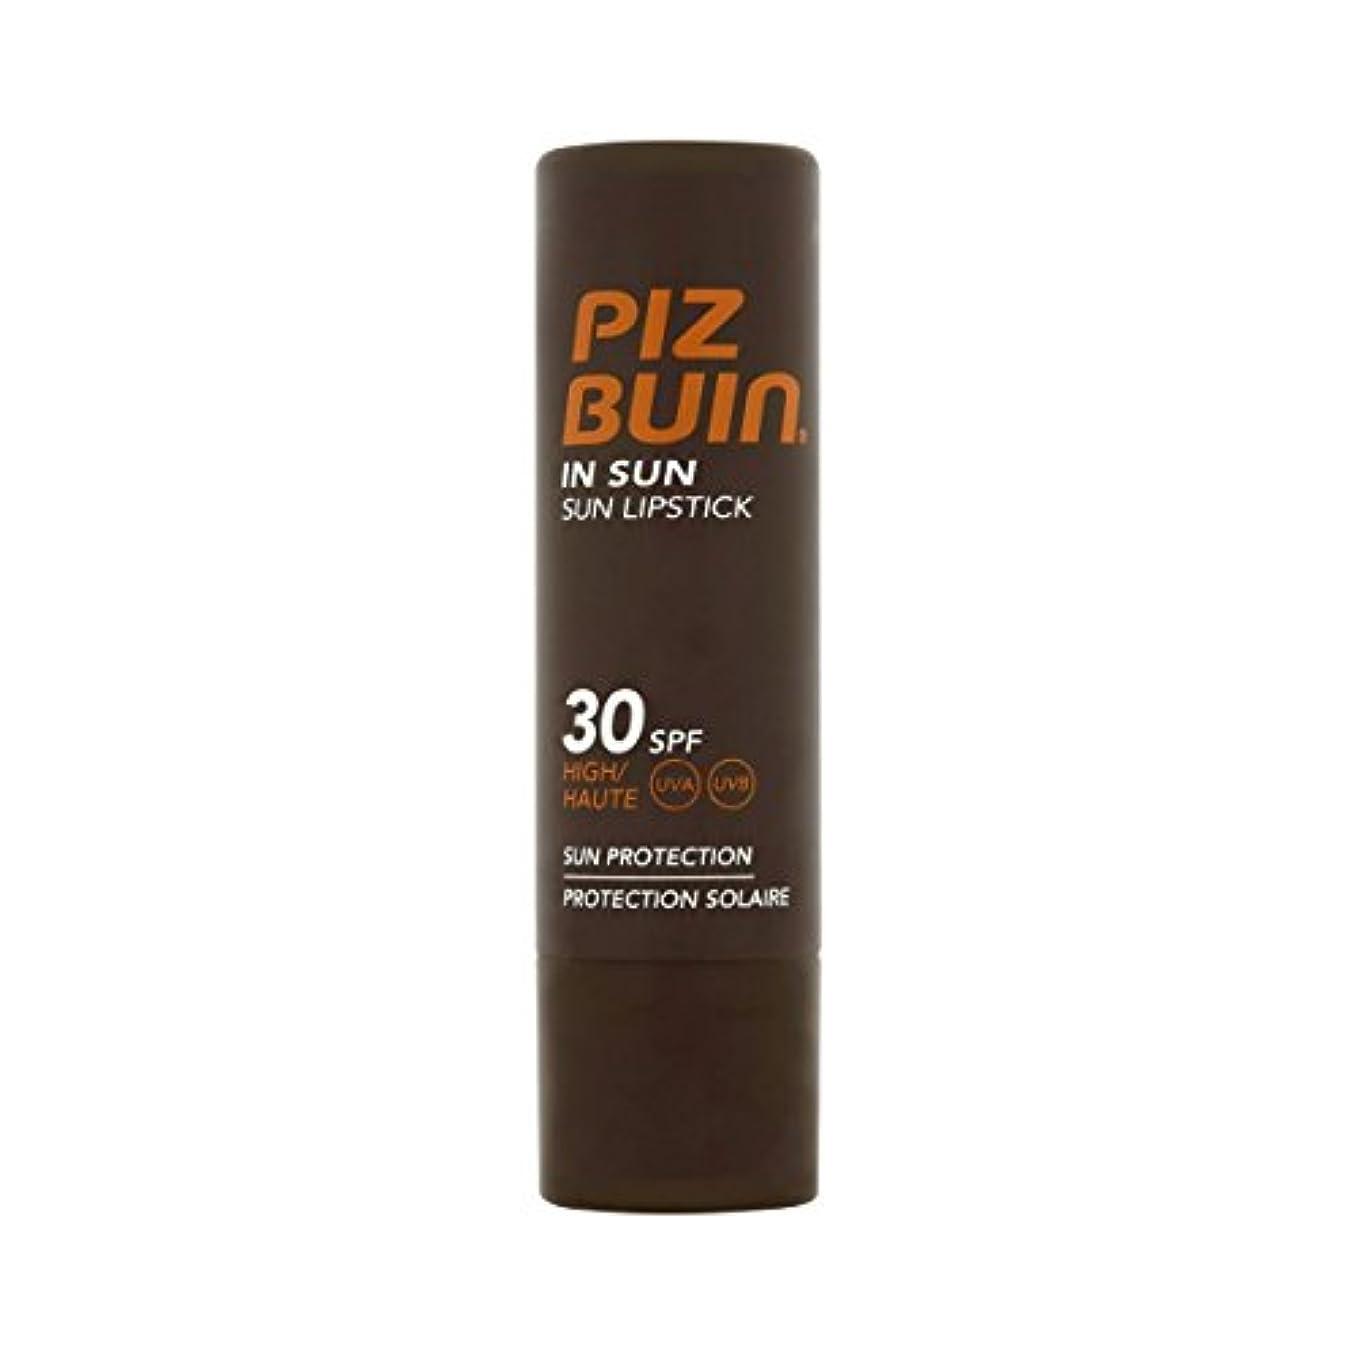 Piz Buin Lipstick Spf 30 5g [並行輸入品]